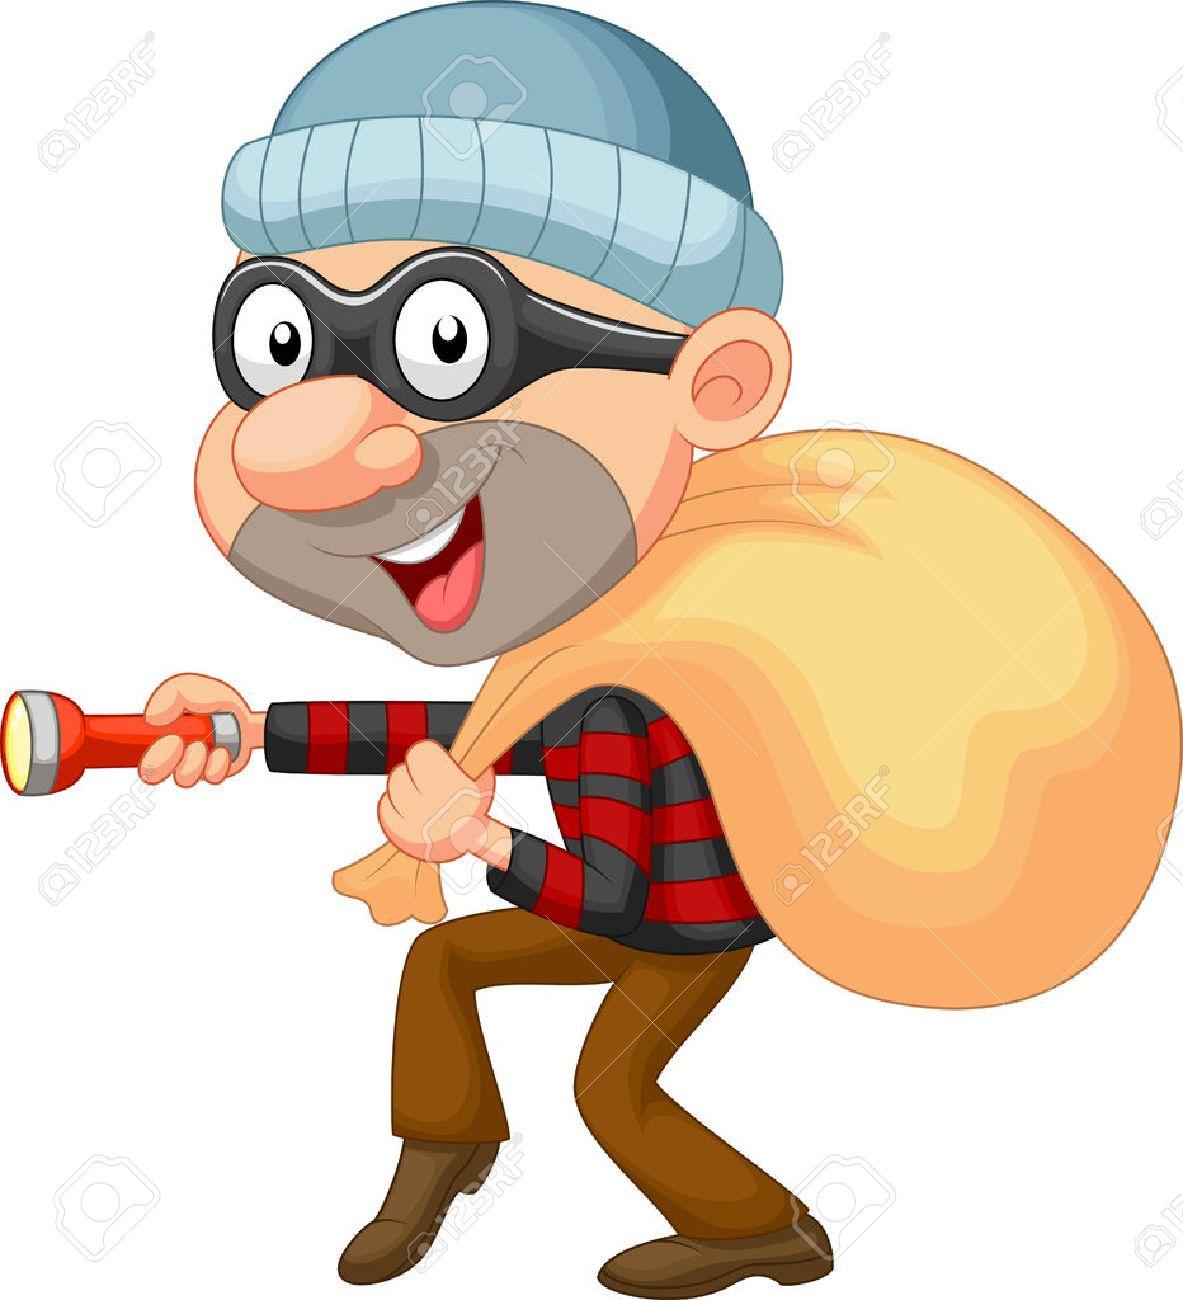 Thief cartoon with sack of money Stock Vector - 23001354